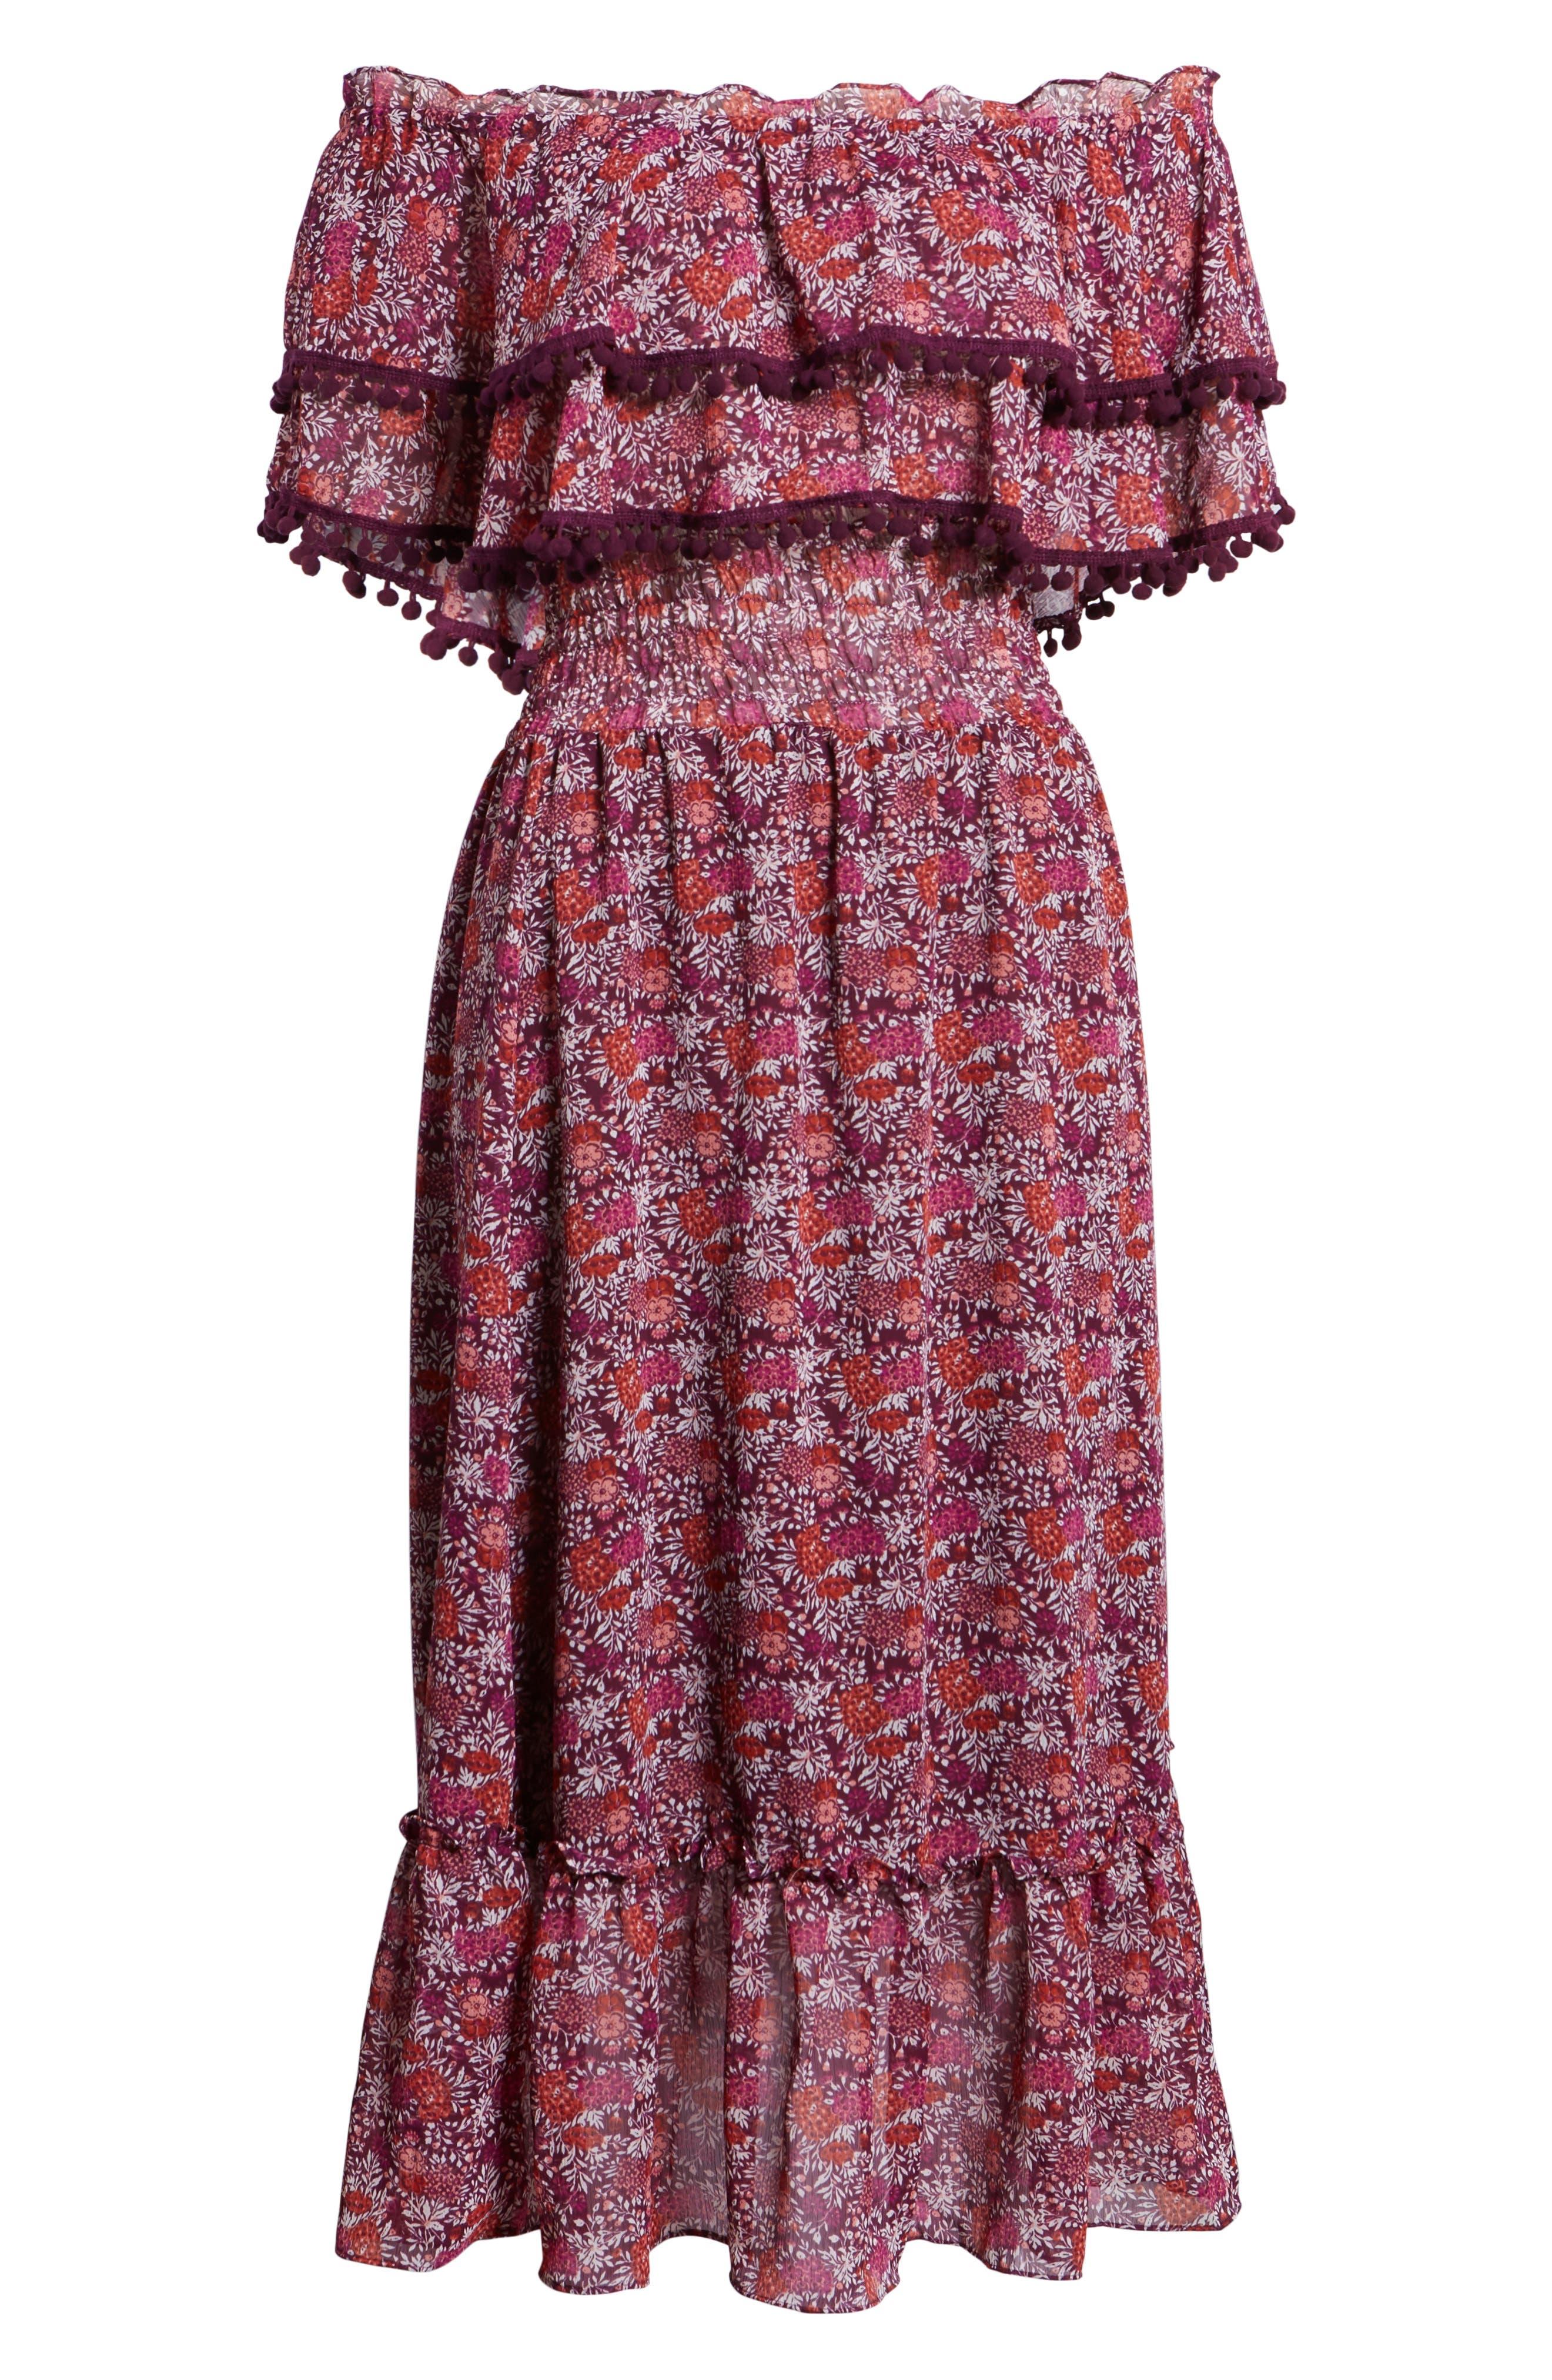 Maribel Off the Shoulder Midi Dress,                             Alternate thumbnail 7, color,                             Multi Fe4